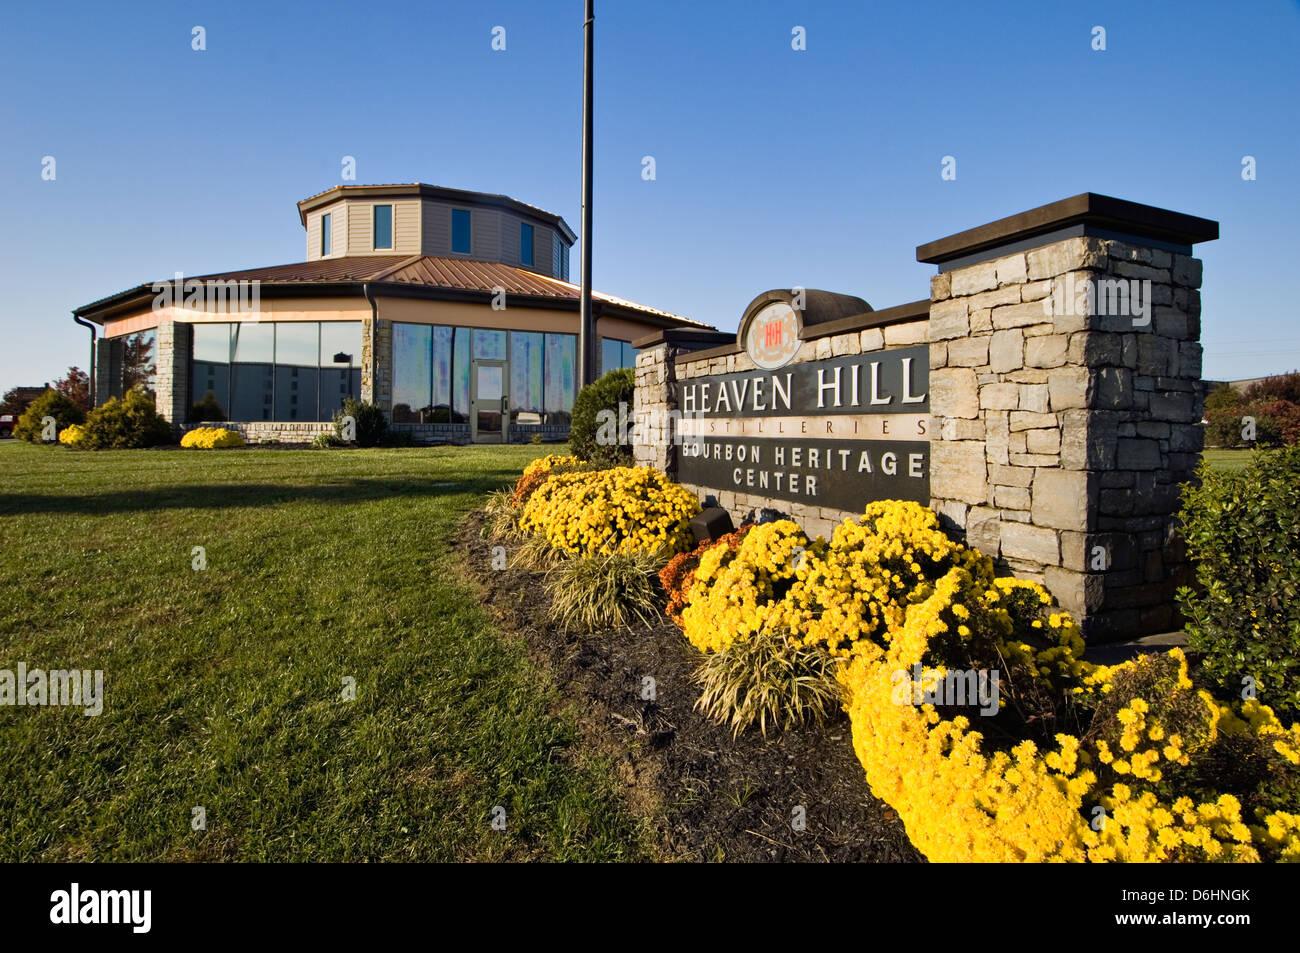 Heaven Hill Distilleries Bourbon Heritage Center in Bardstown, Kentucky - Stock Image